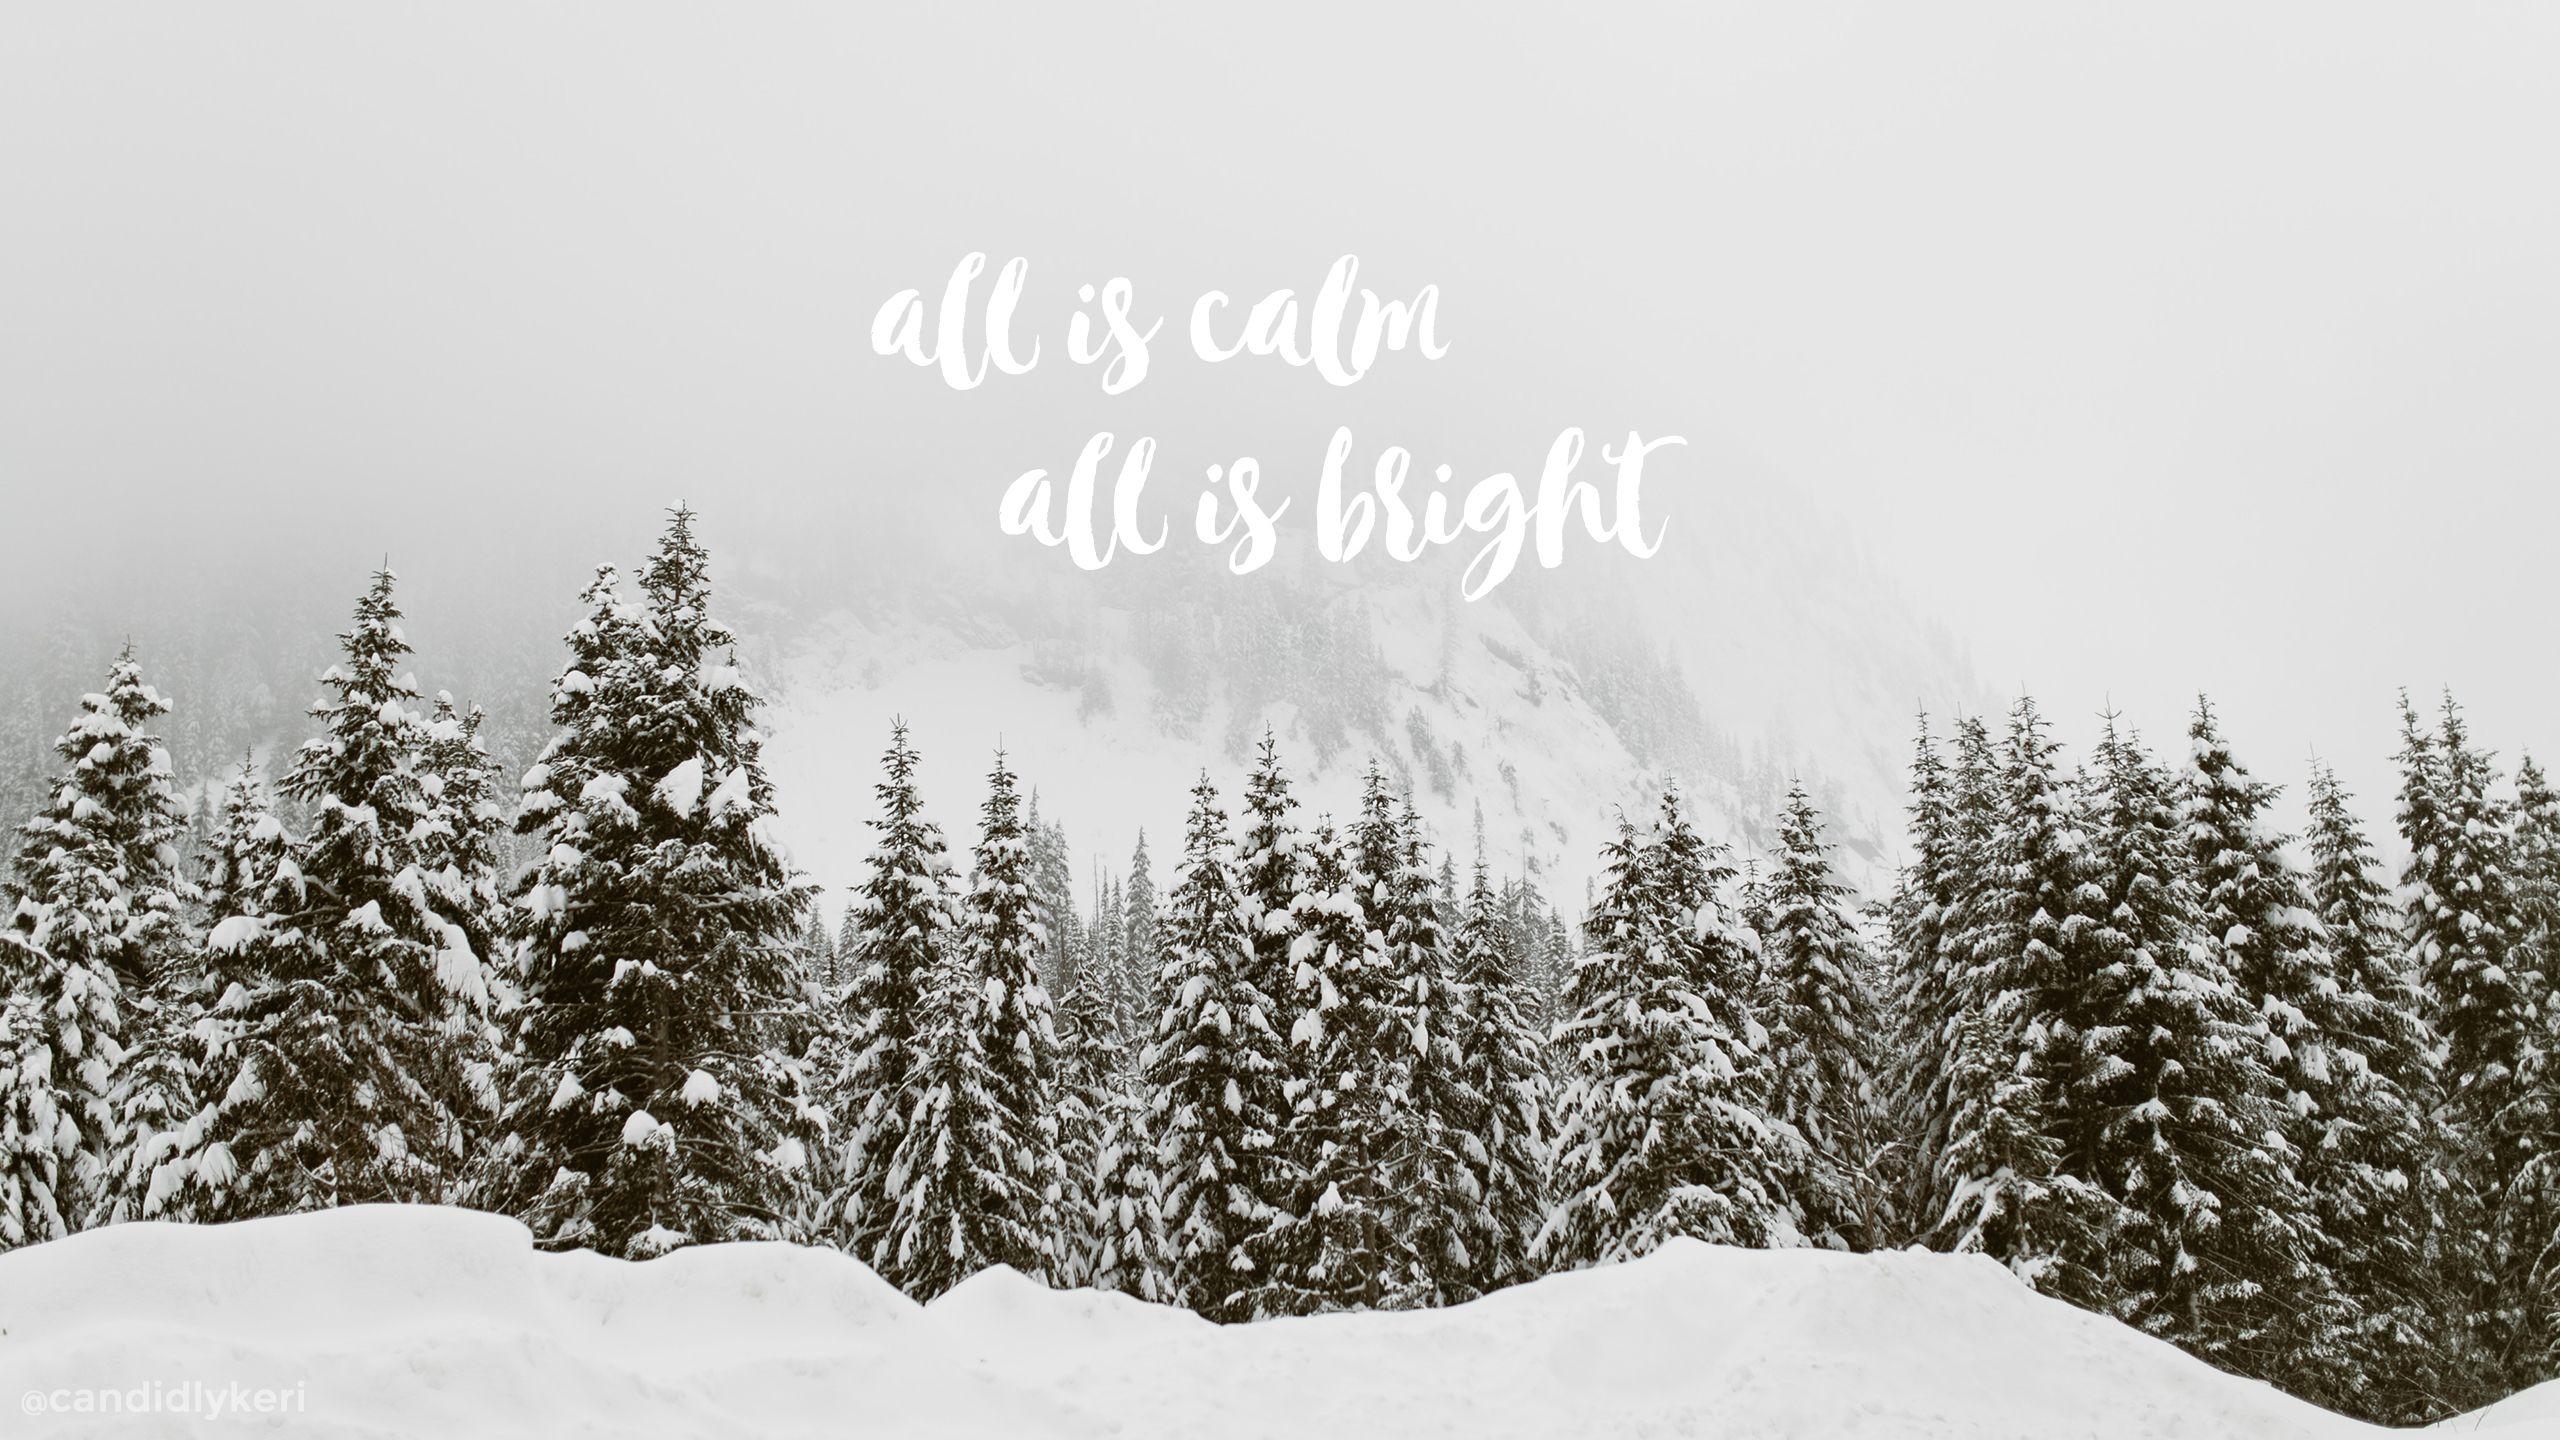 2017 December5 Jpg 2560 1440 Christmas Desktop Wallpaper Winter Wallpaper Desktop Winter Wallpaper